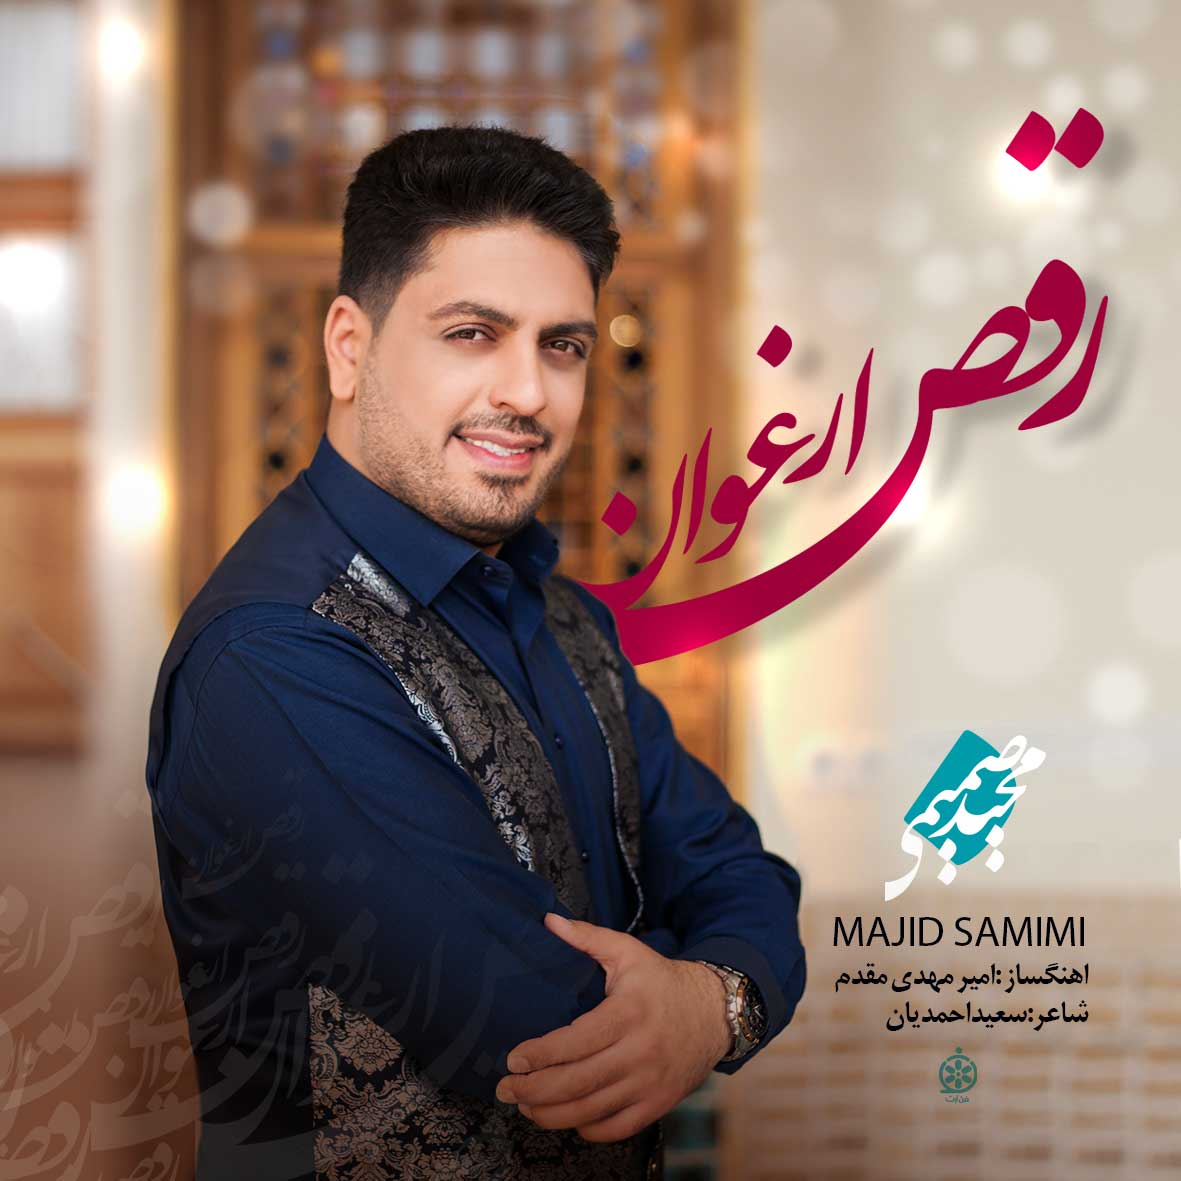 majid samimi raghse arghavan دانلود اهنگ رقص ارغوان مجید صمیمی